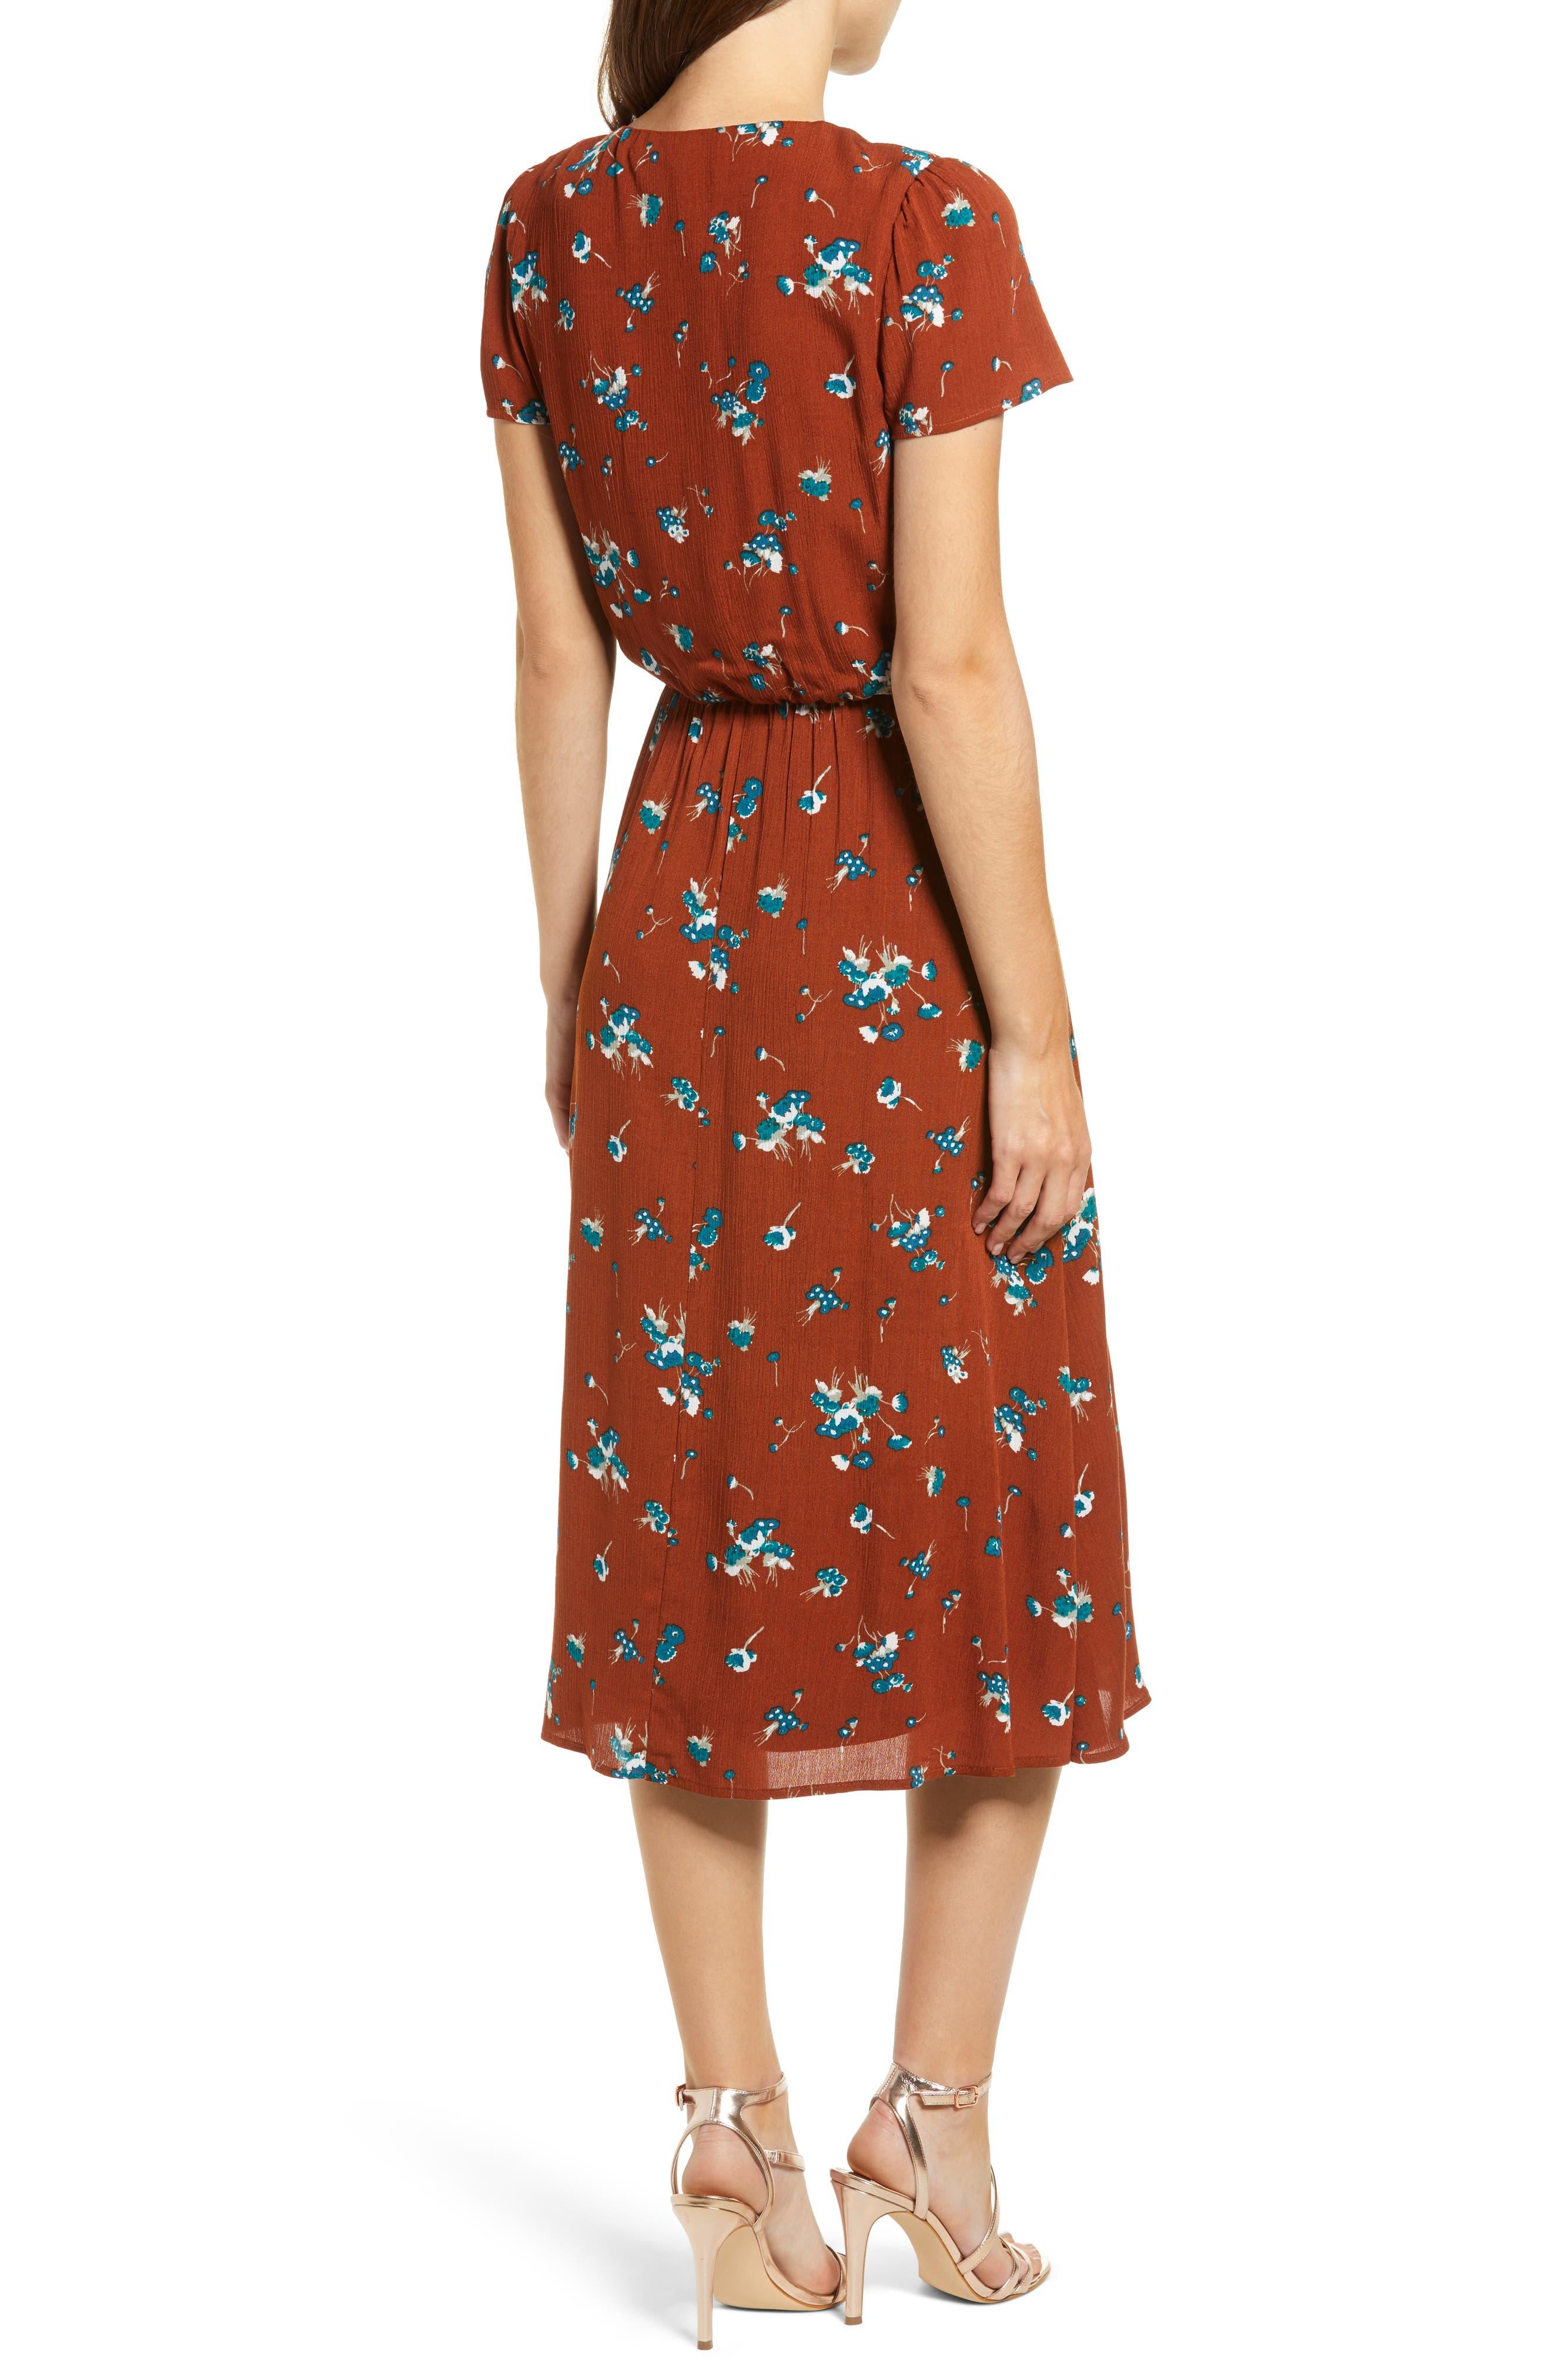 Blouson Midi Dress,                             Alternate thumbnail 2, color,                             BROWN SPICE FLORAL